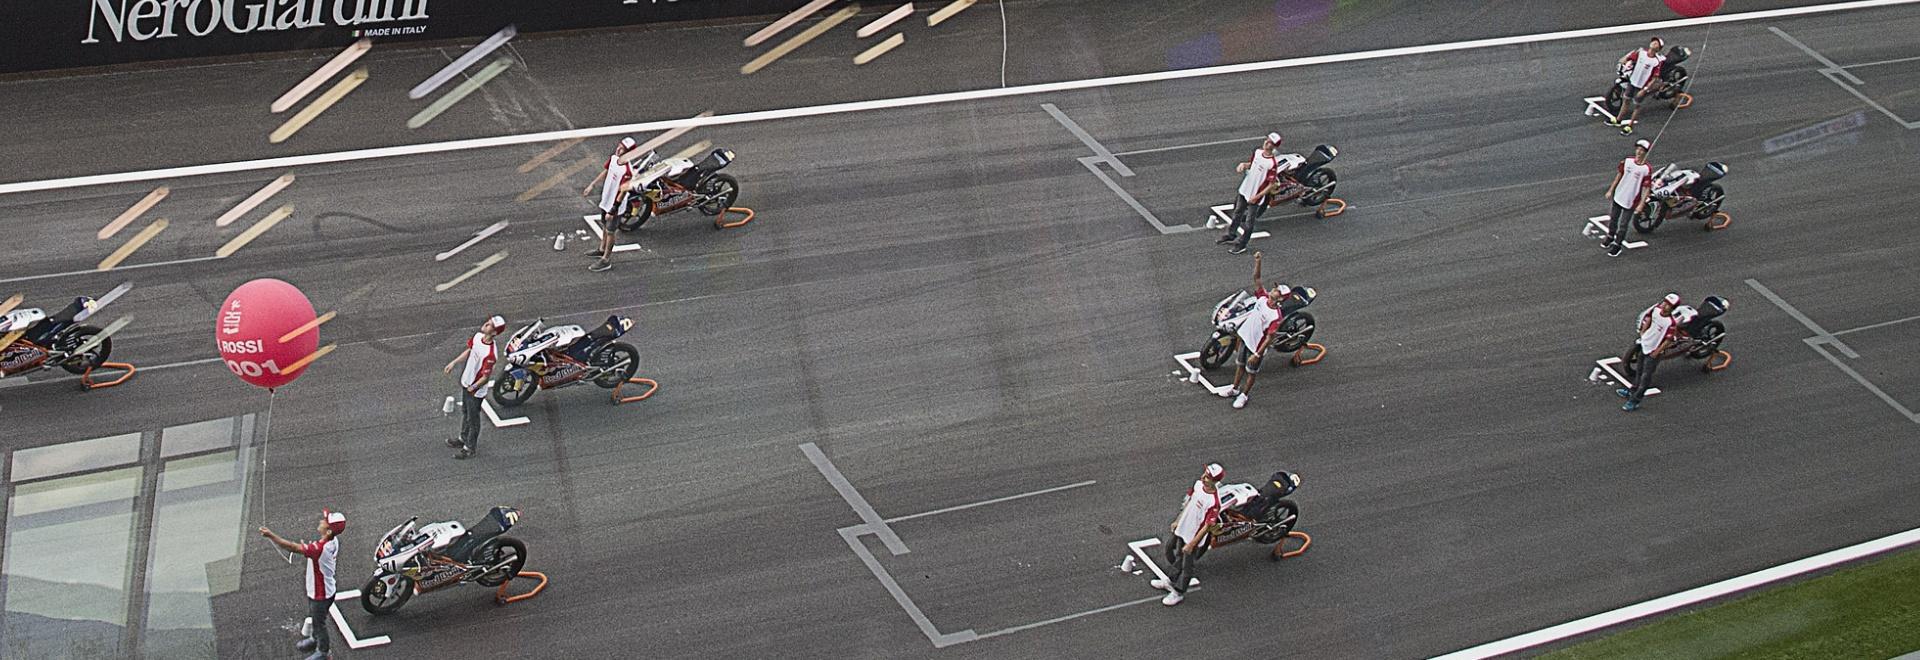 GP San Marino. Round 10